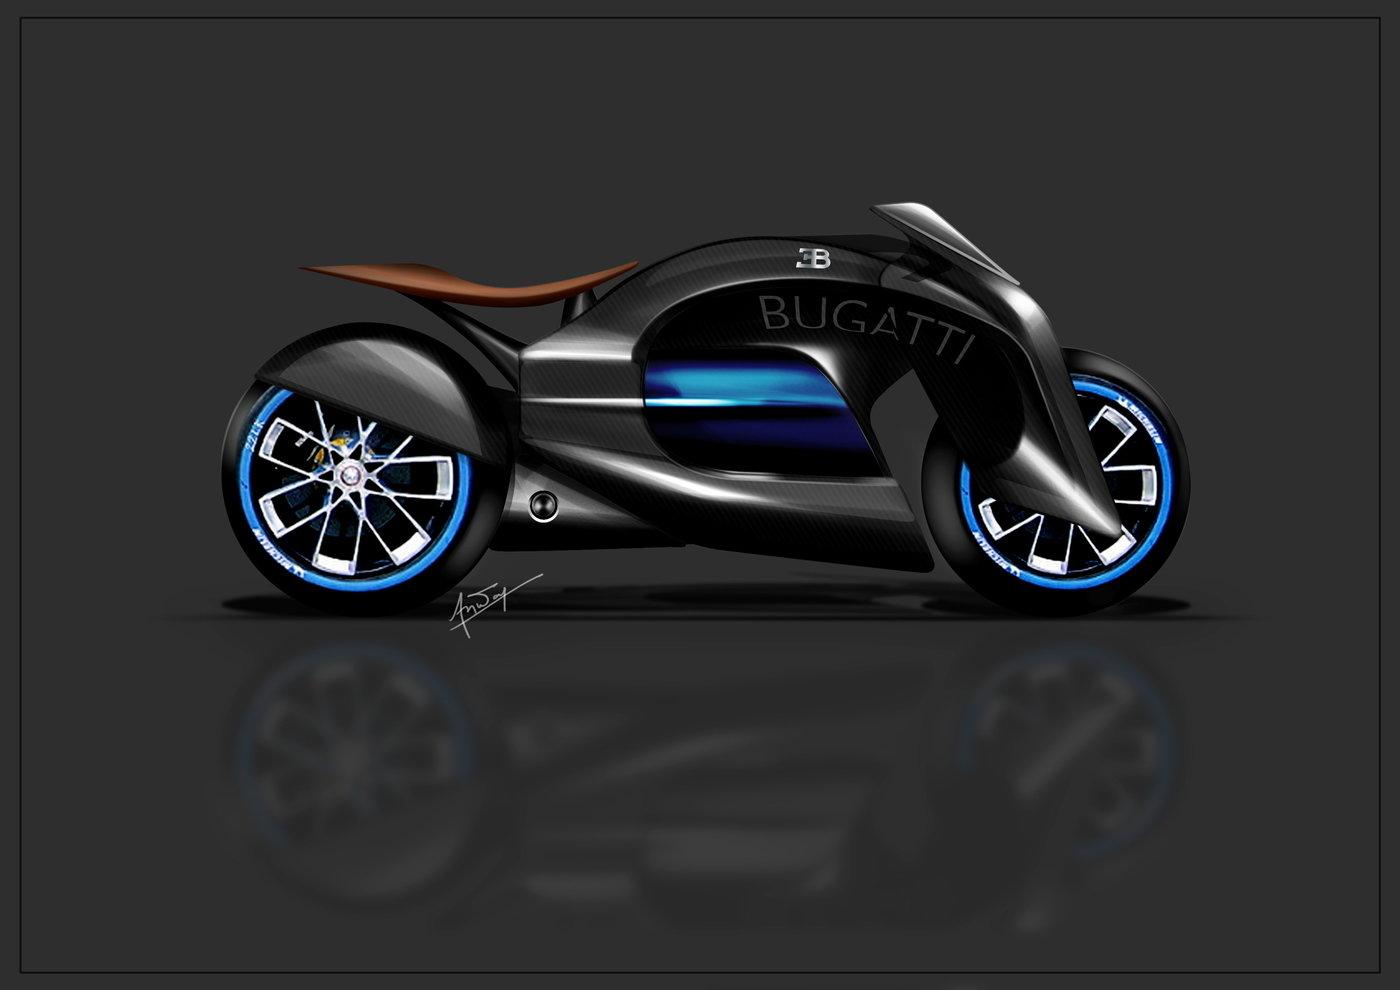 Bugatti Bike Design Concept By Mohammed Anwar At